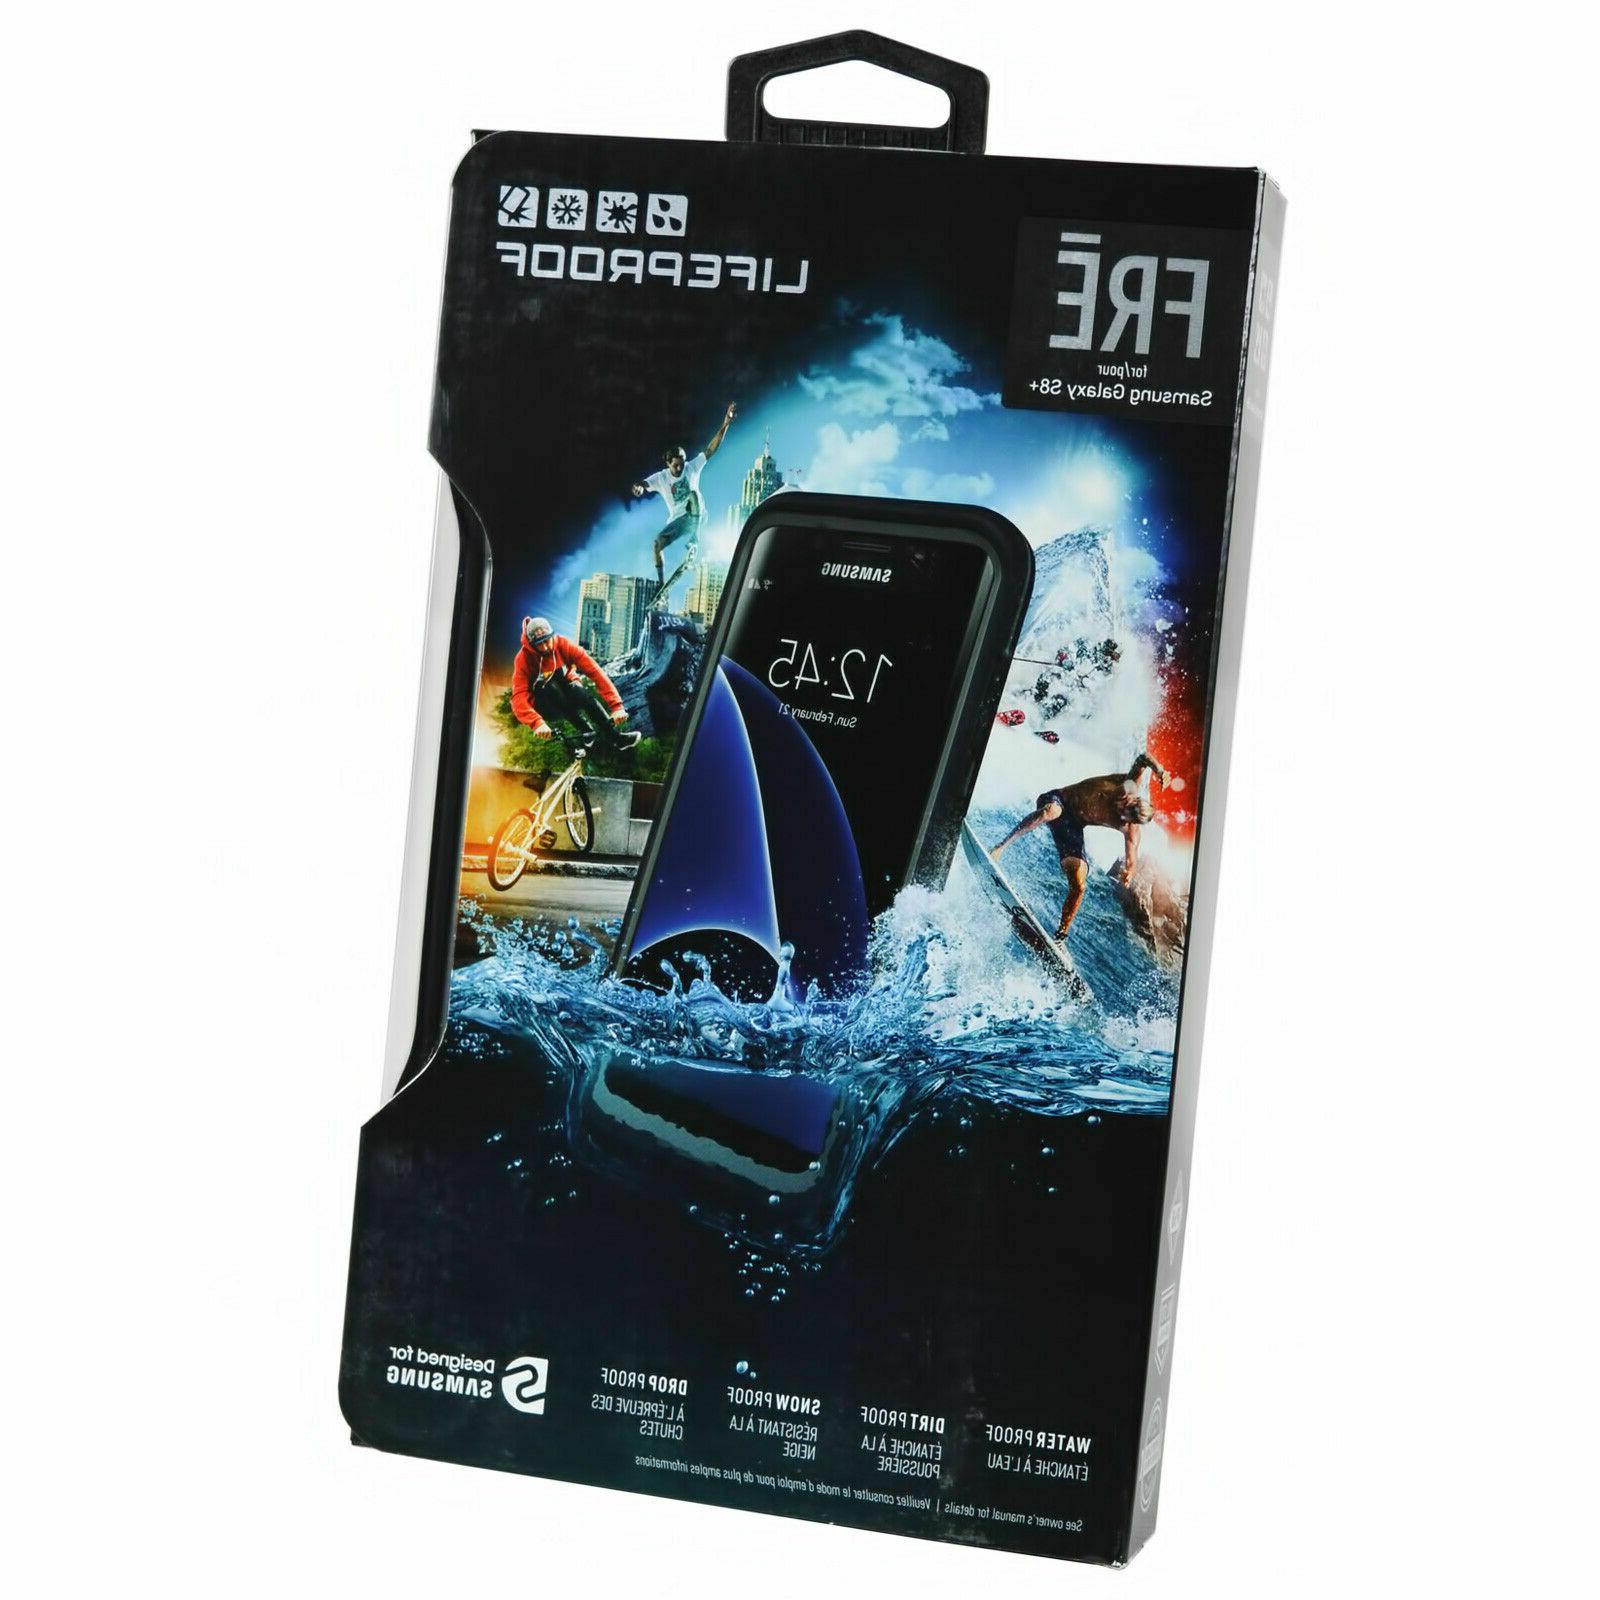 waterproof fre case cover